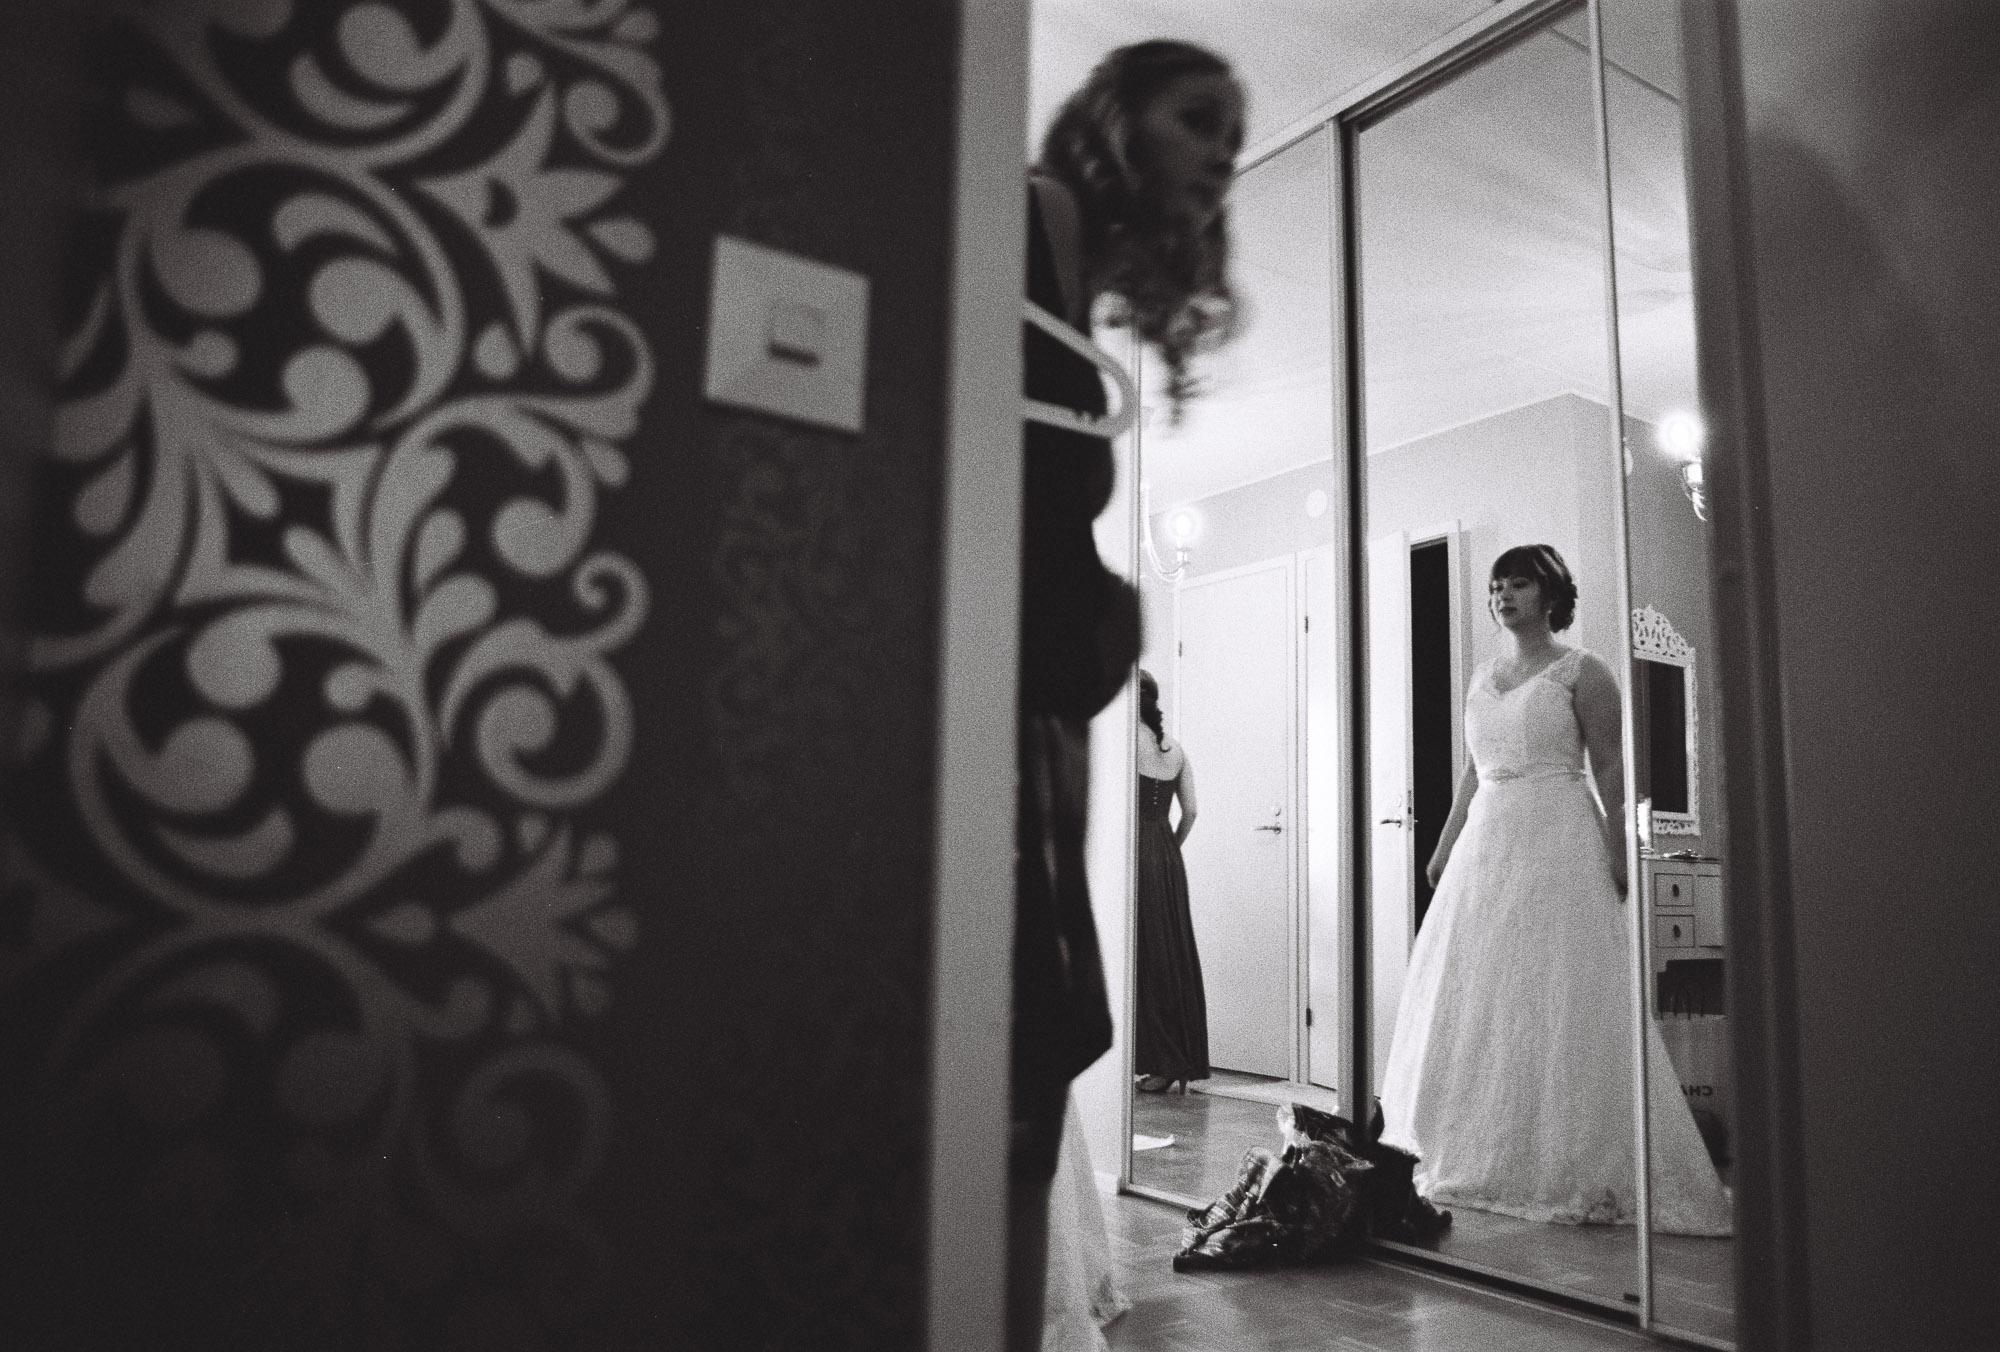 jere-satamo-analog-film-wedding-photographer-finland-020.jpg